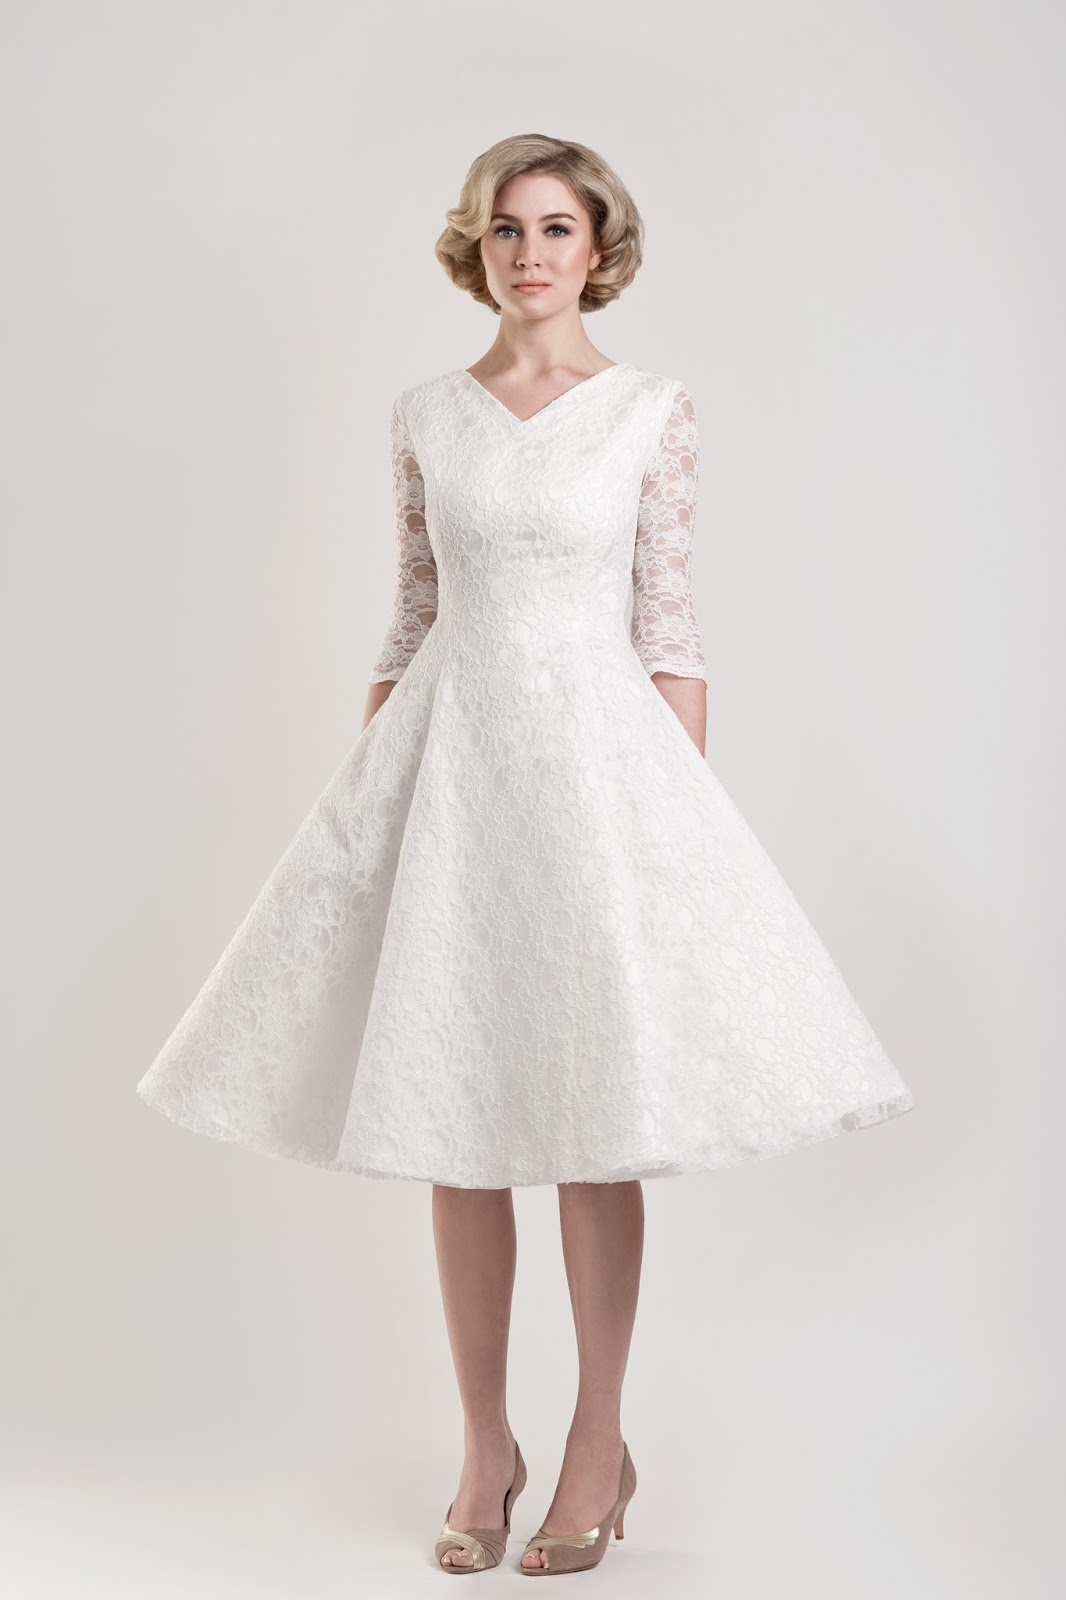 wedding dresses cold climates: Pictures Of Wedding Dresses For Older ...